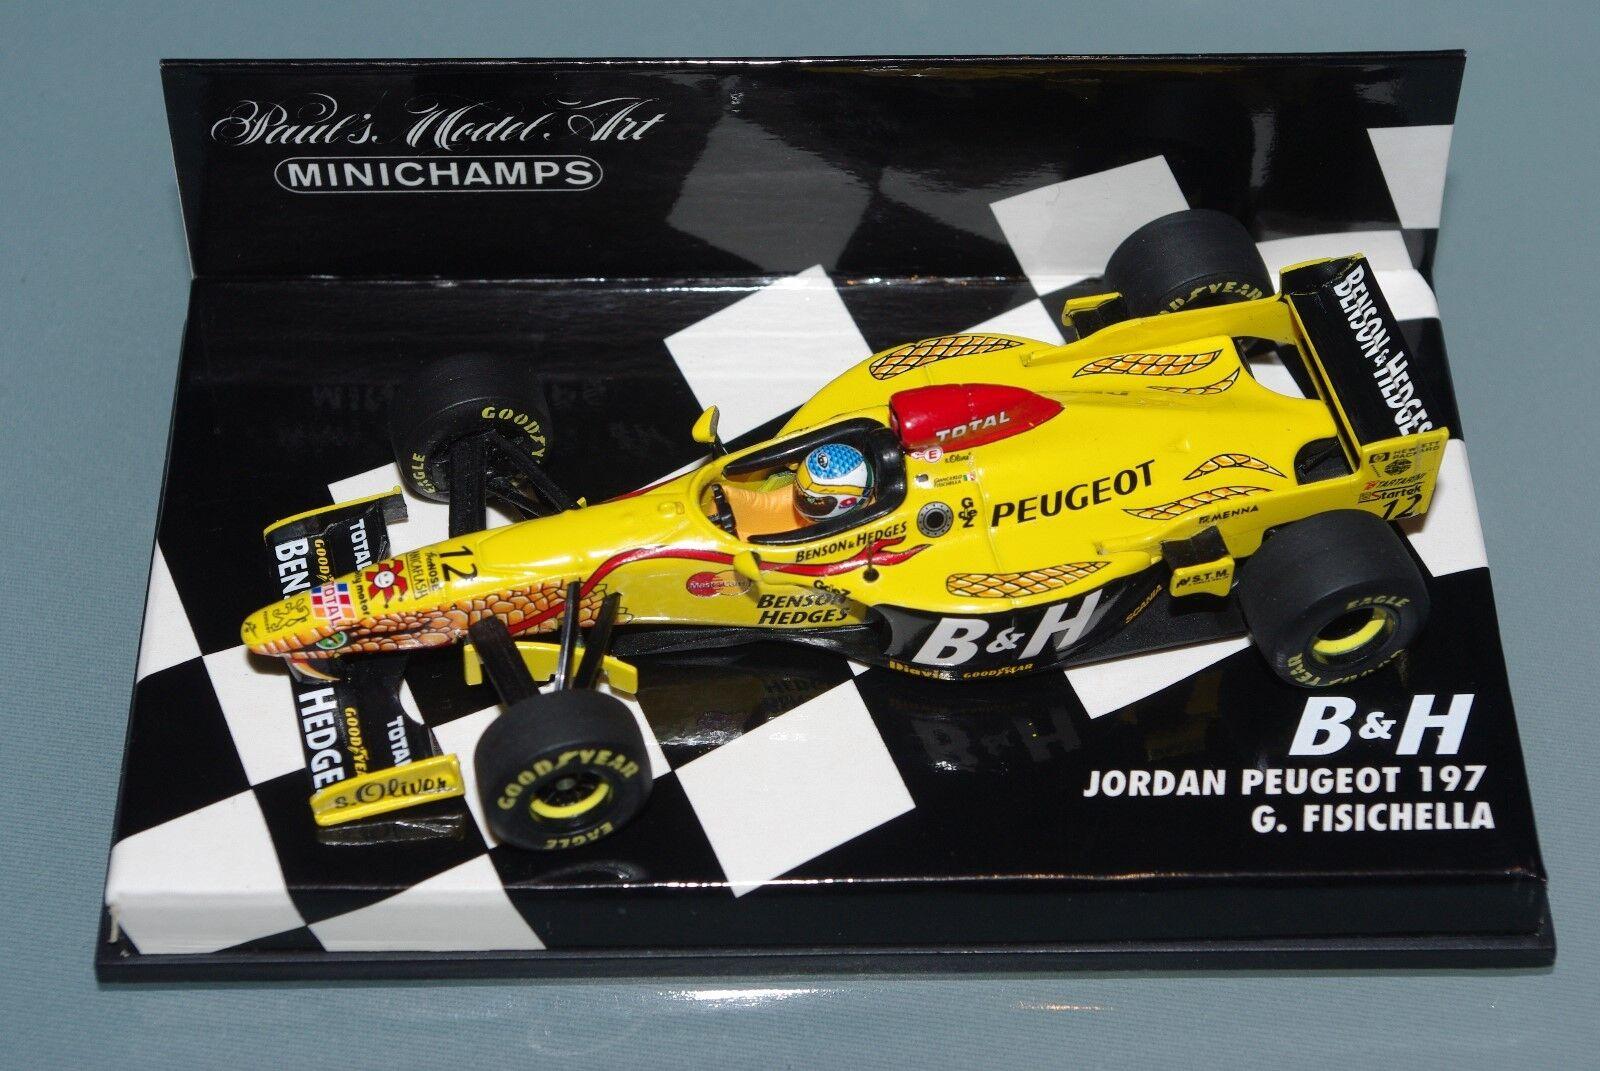 Minichamps F1 1 43 Jordan Peugeot 197 B&h Tobbaco conversión-Ferrari